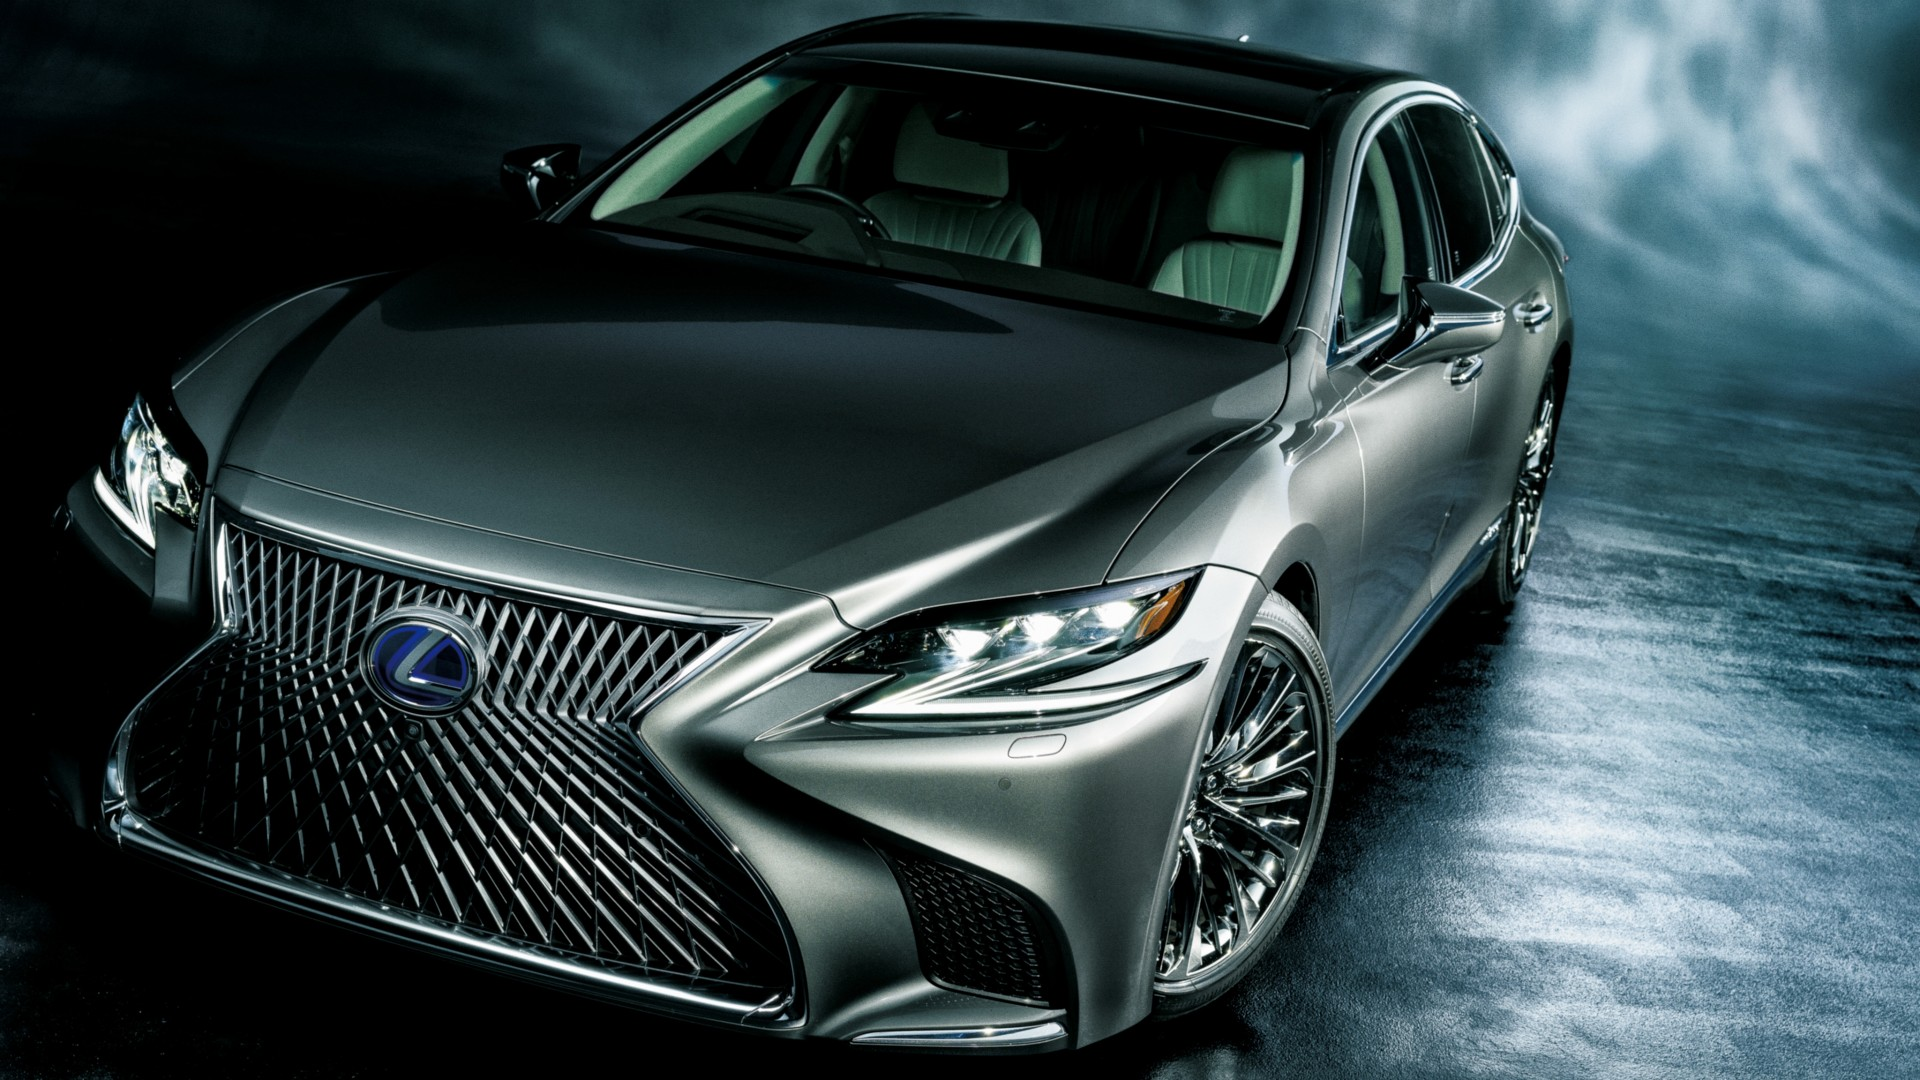 Lexus LS 500h 2018 4K 3 Wallpaper | HD Car Wallpapers | ID ...